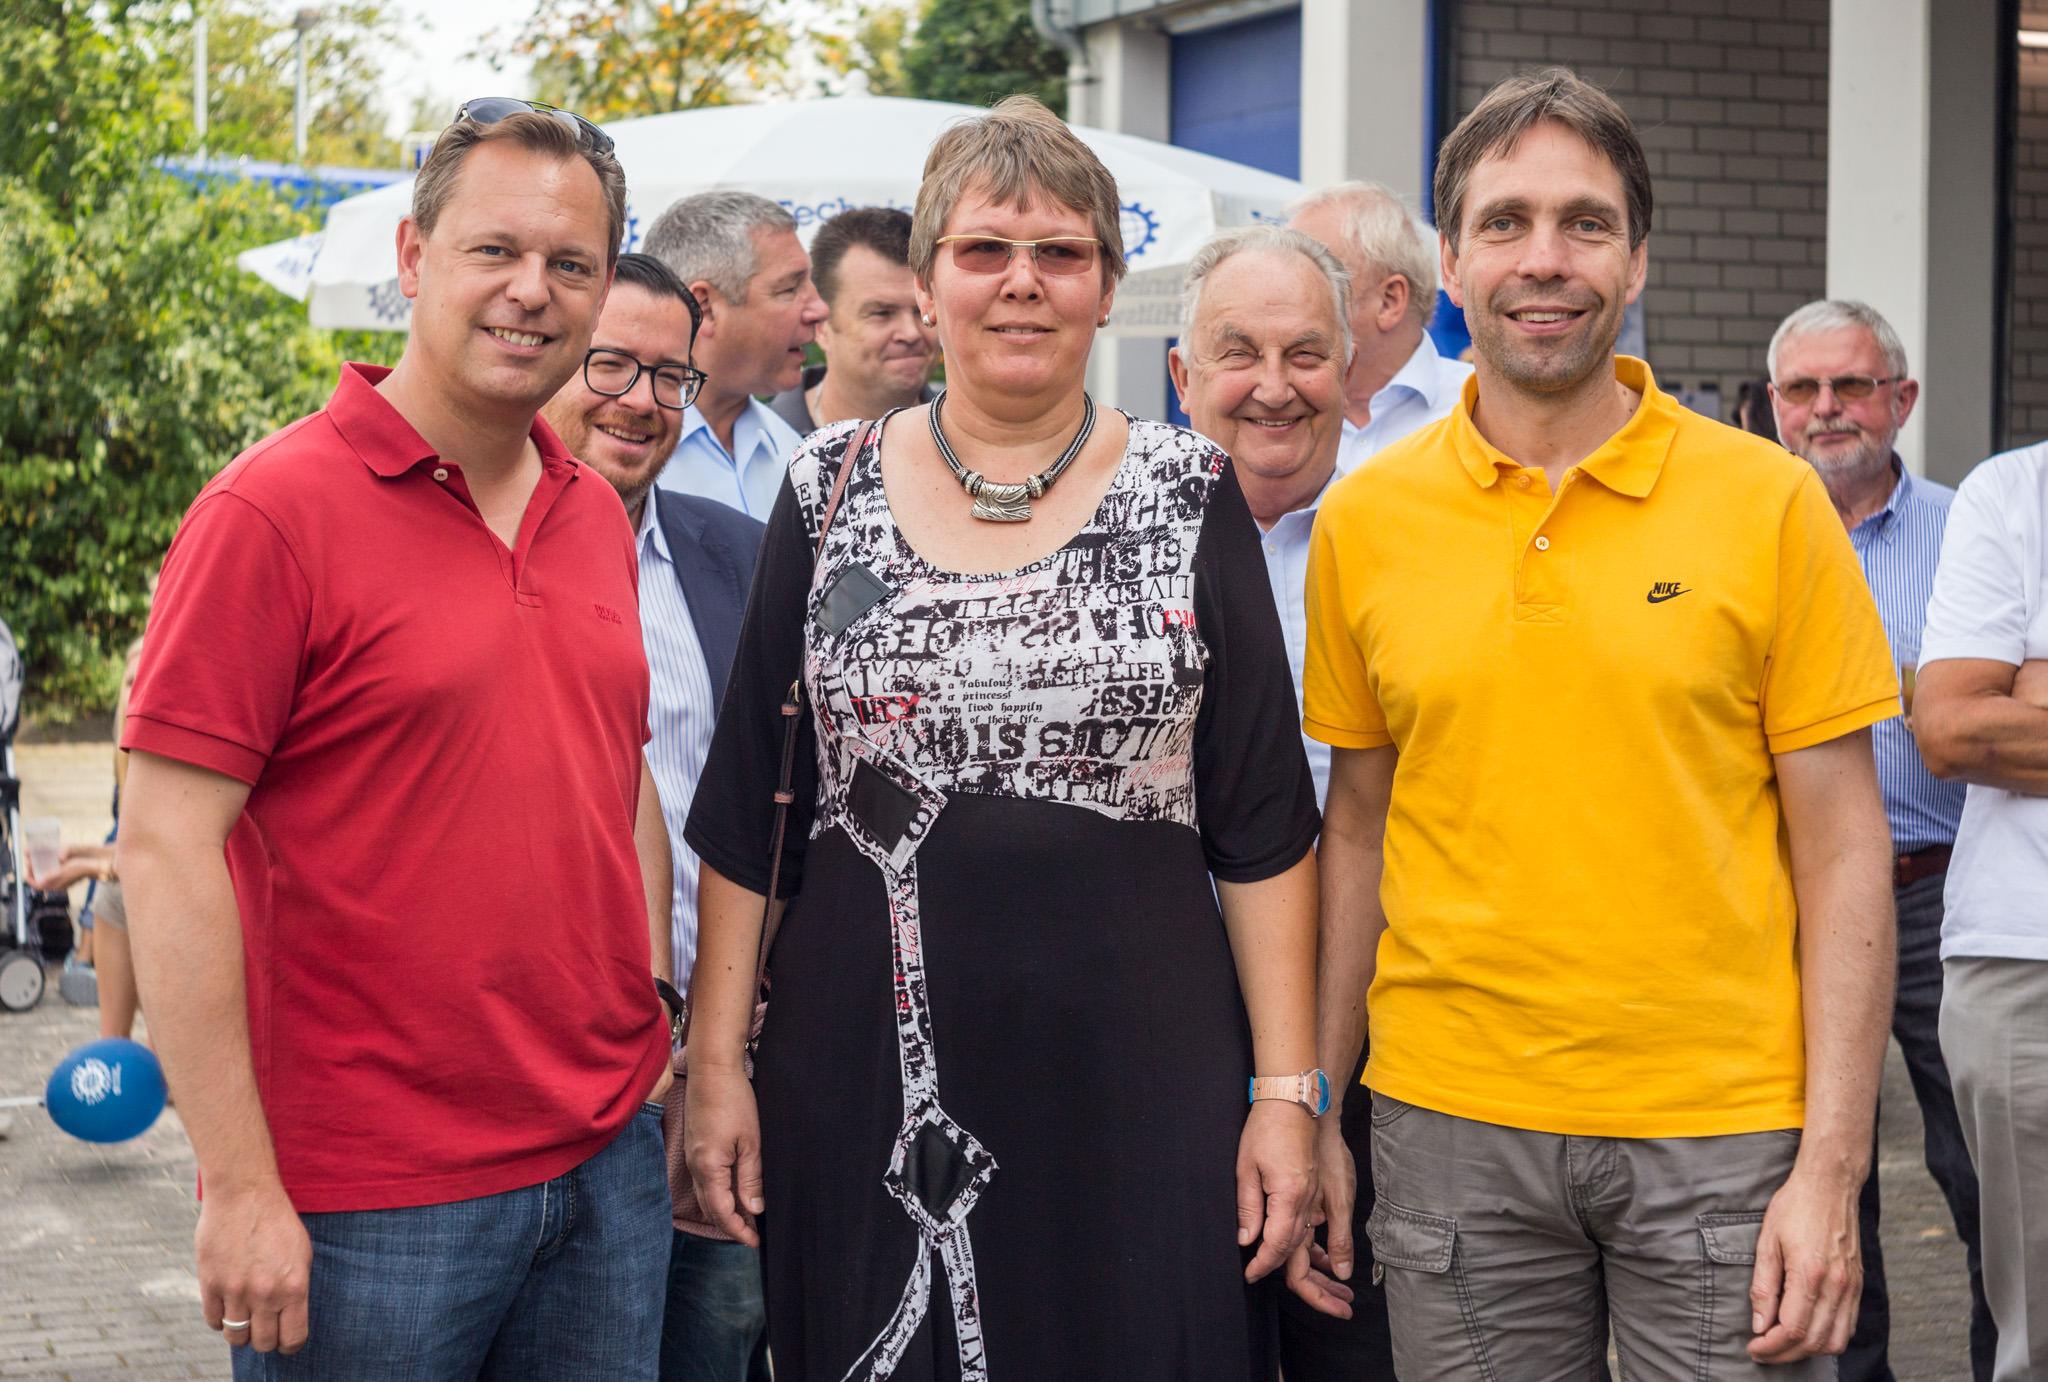 v.l.n.r.: Thilo Seipel (Fraktionsvorsitzender), Maike Burchards und Andreas Frache (Stadtrat)